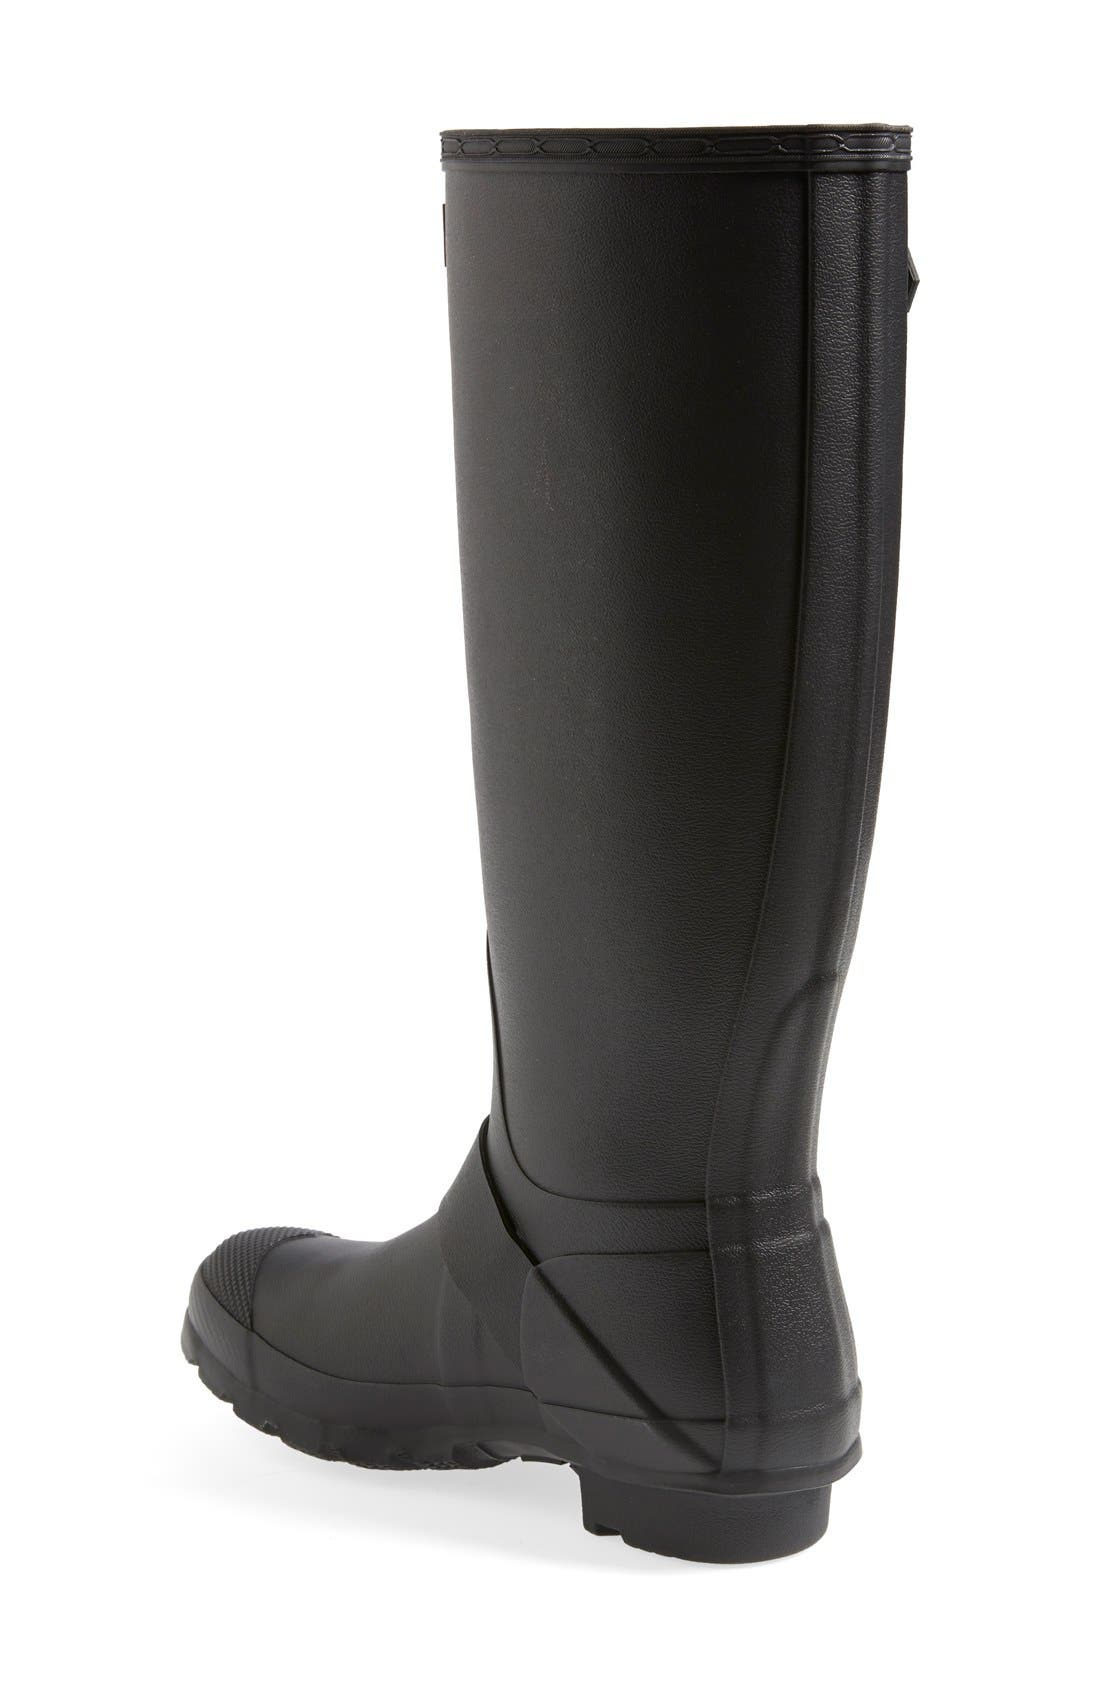 Alternate Image 2  - Hunter 'Tall Moto' Rain Boot (Nordstrom Exclusive) (Women)